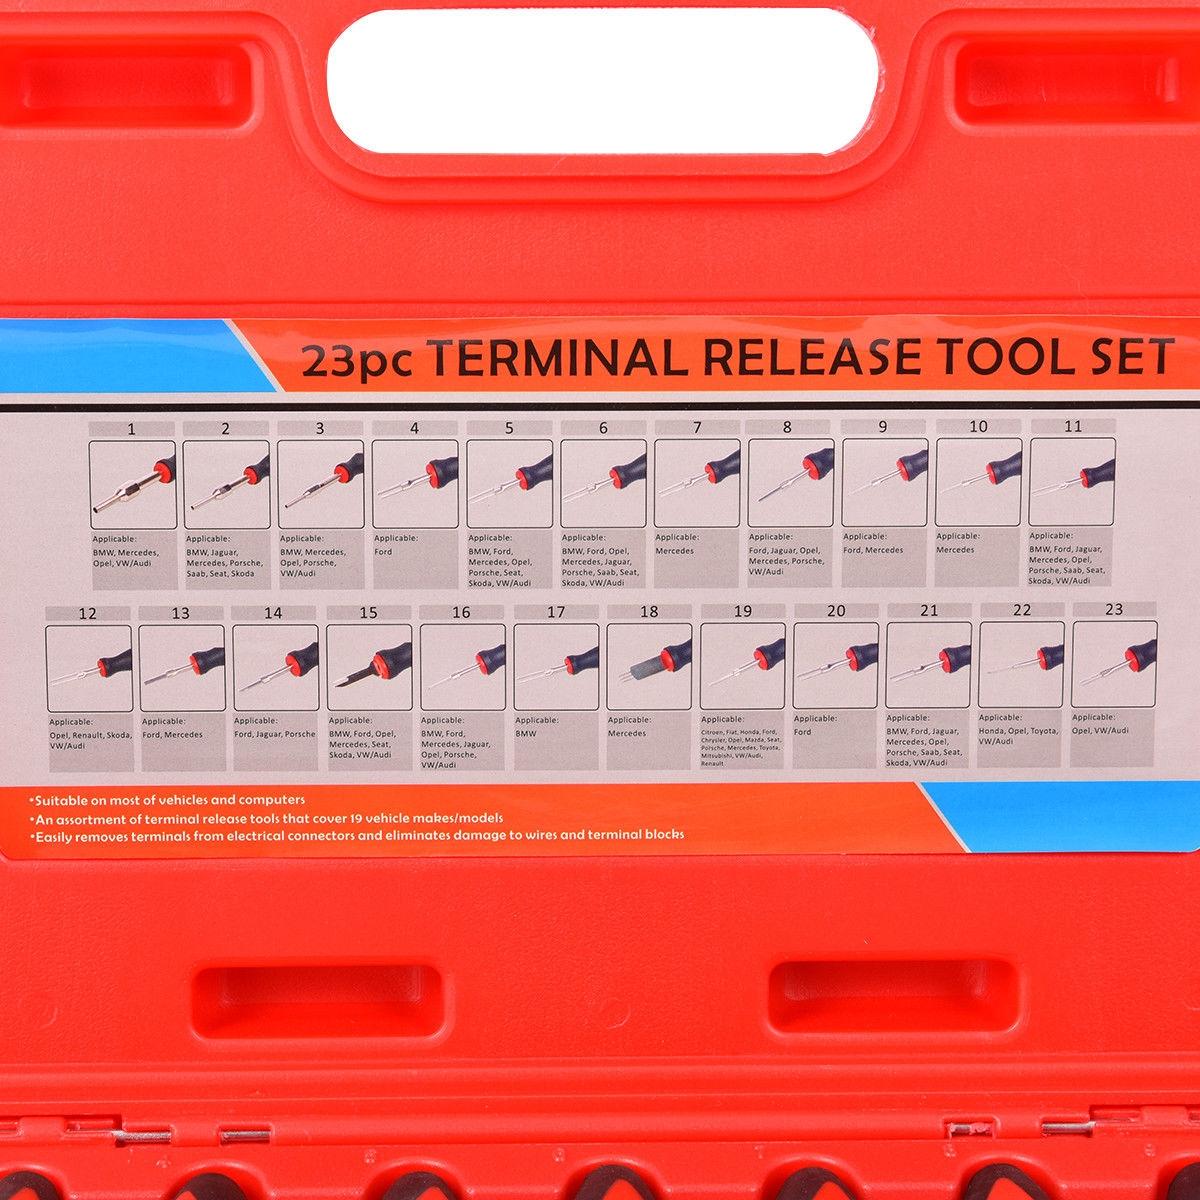 23 pcs Universal Terminal Release Tool Set